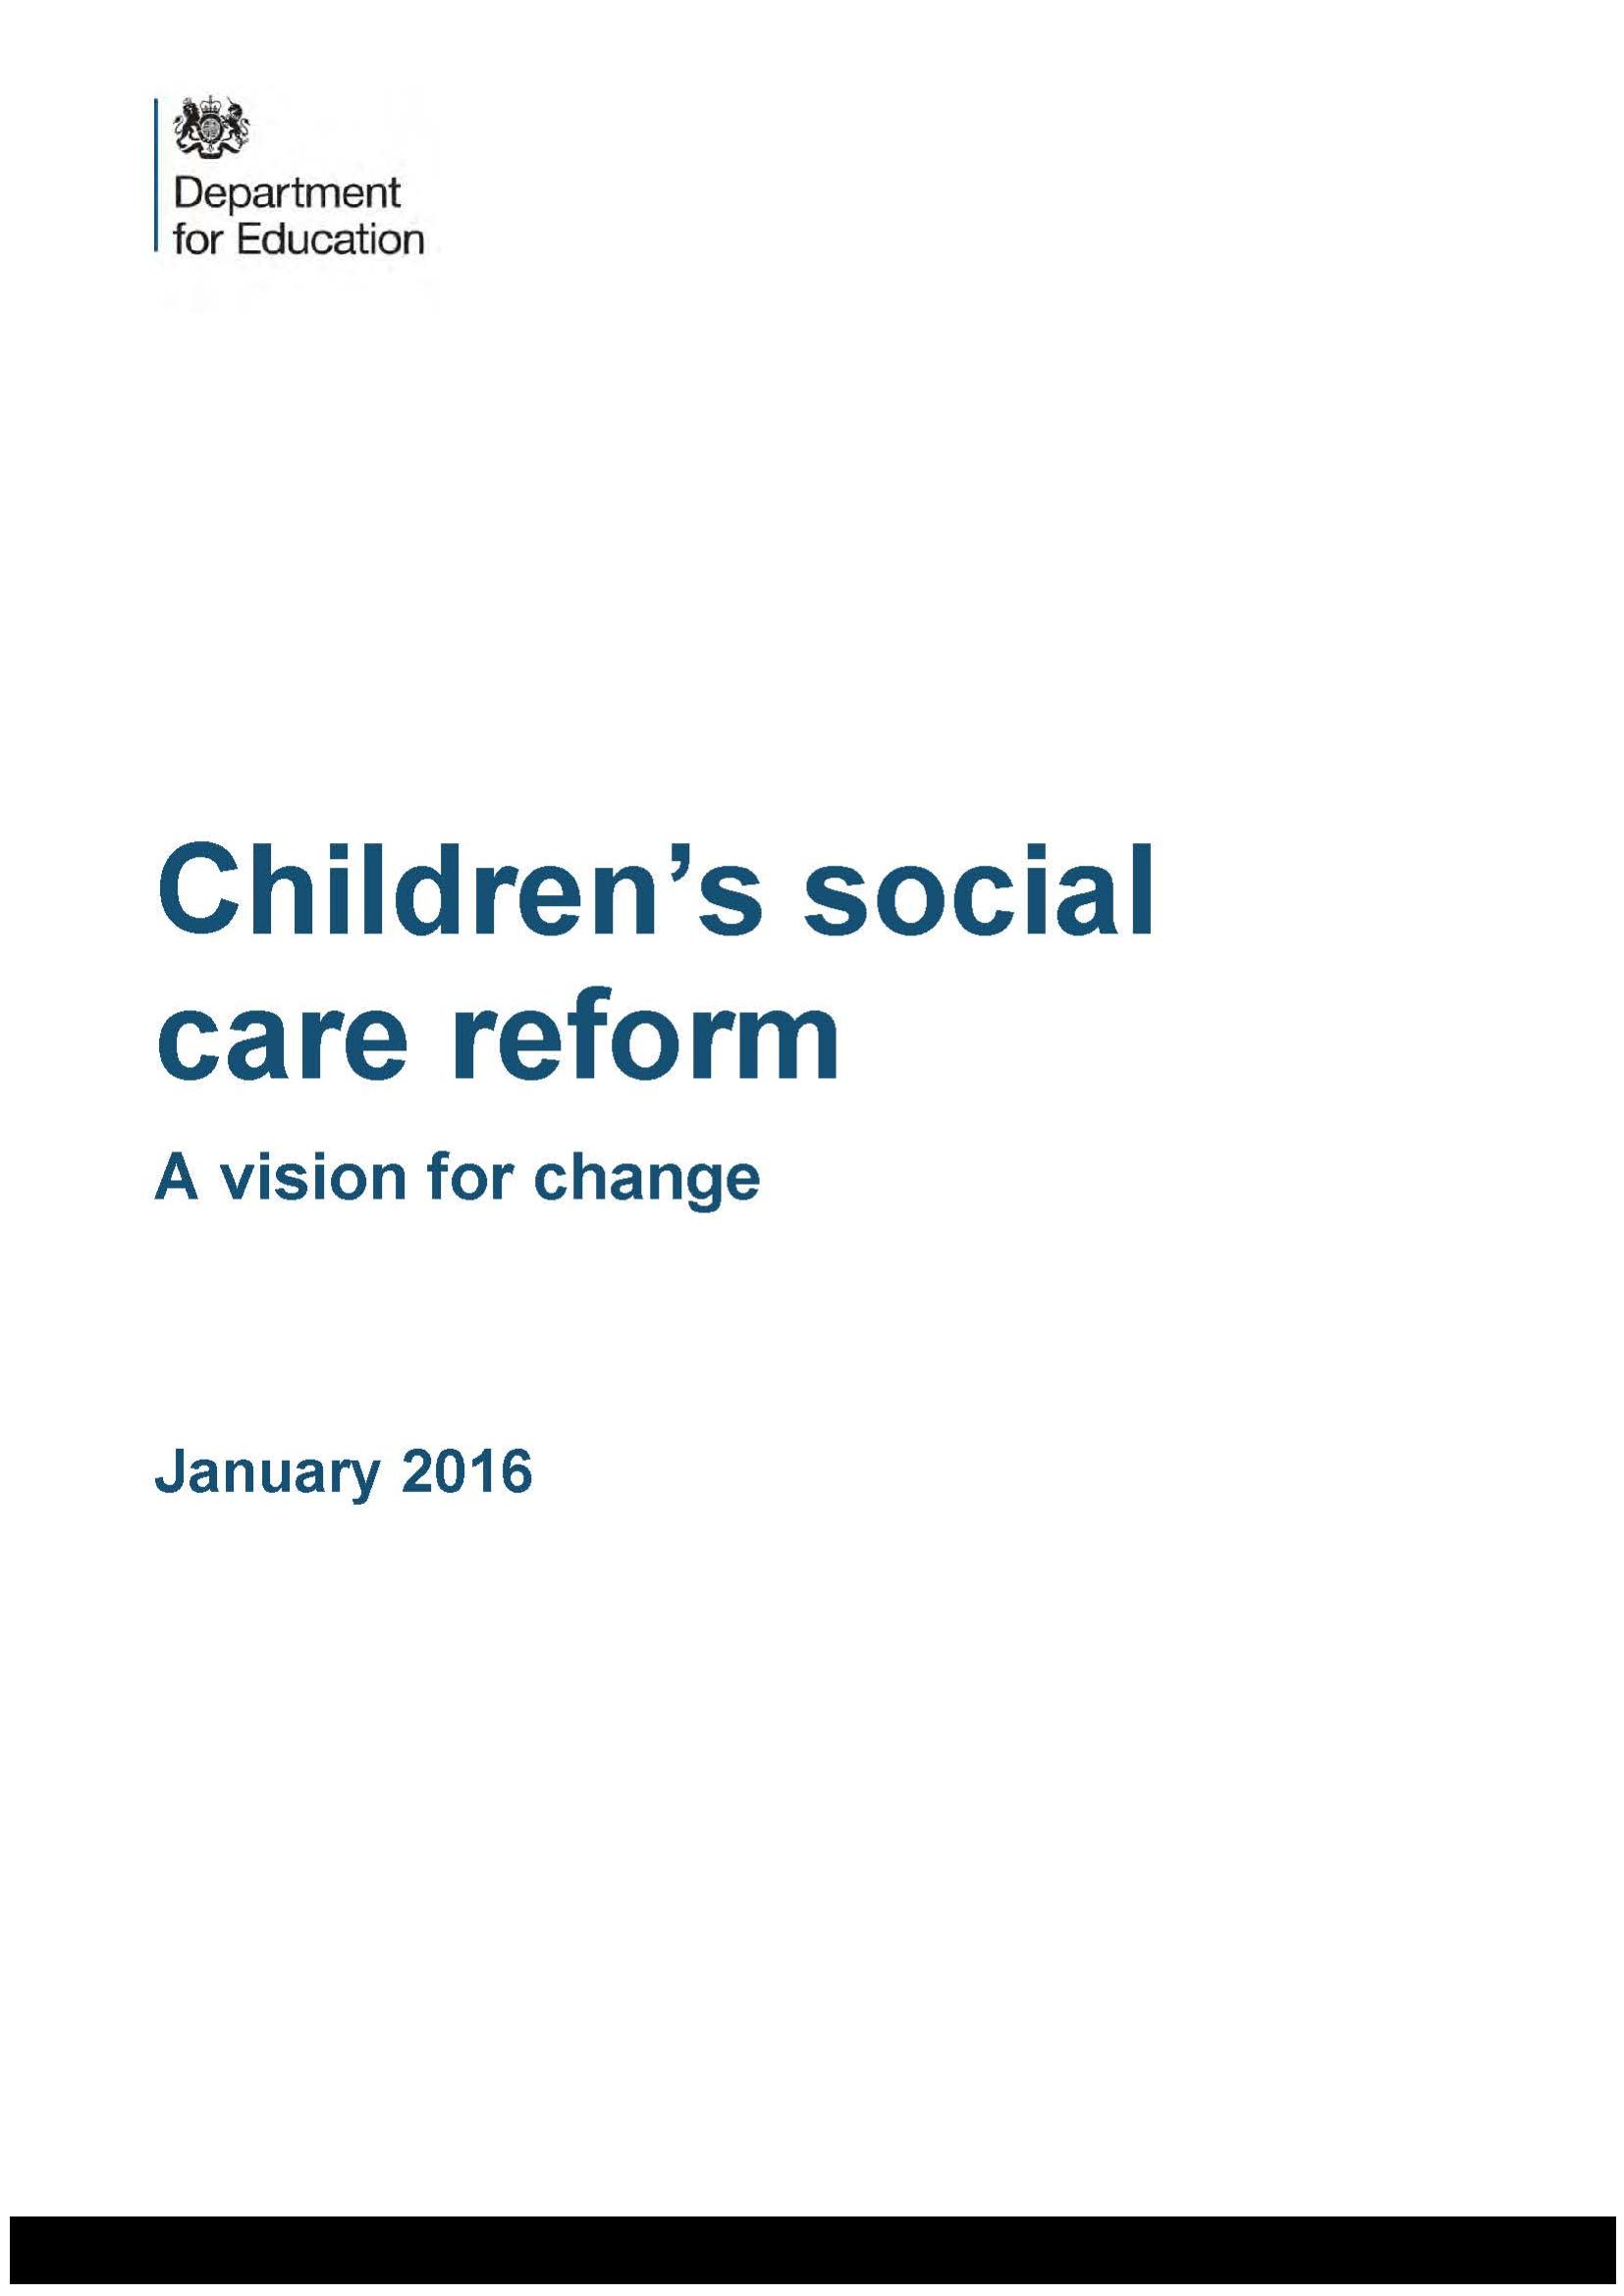 Children's Social Care Reform